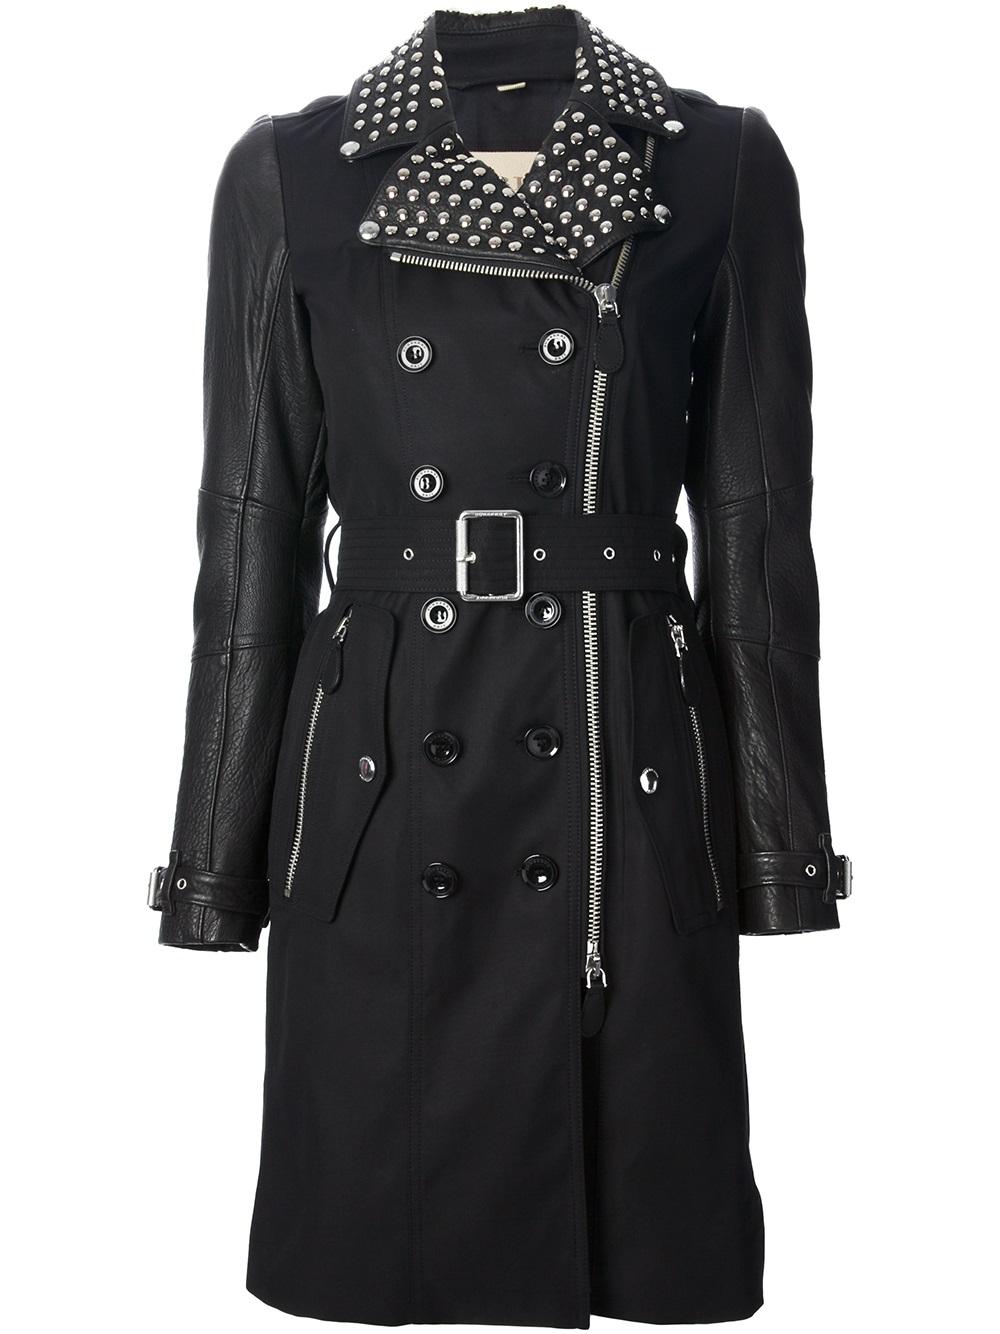 lyst burberry brit studded trench coat in black. Black Bedroom Furniture Sets. Home Design Ideas